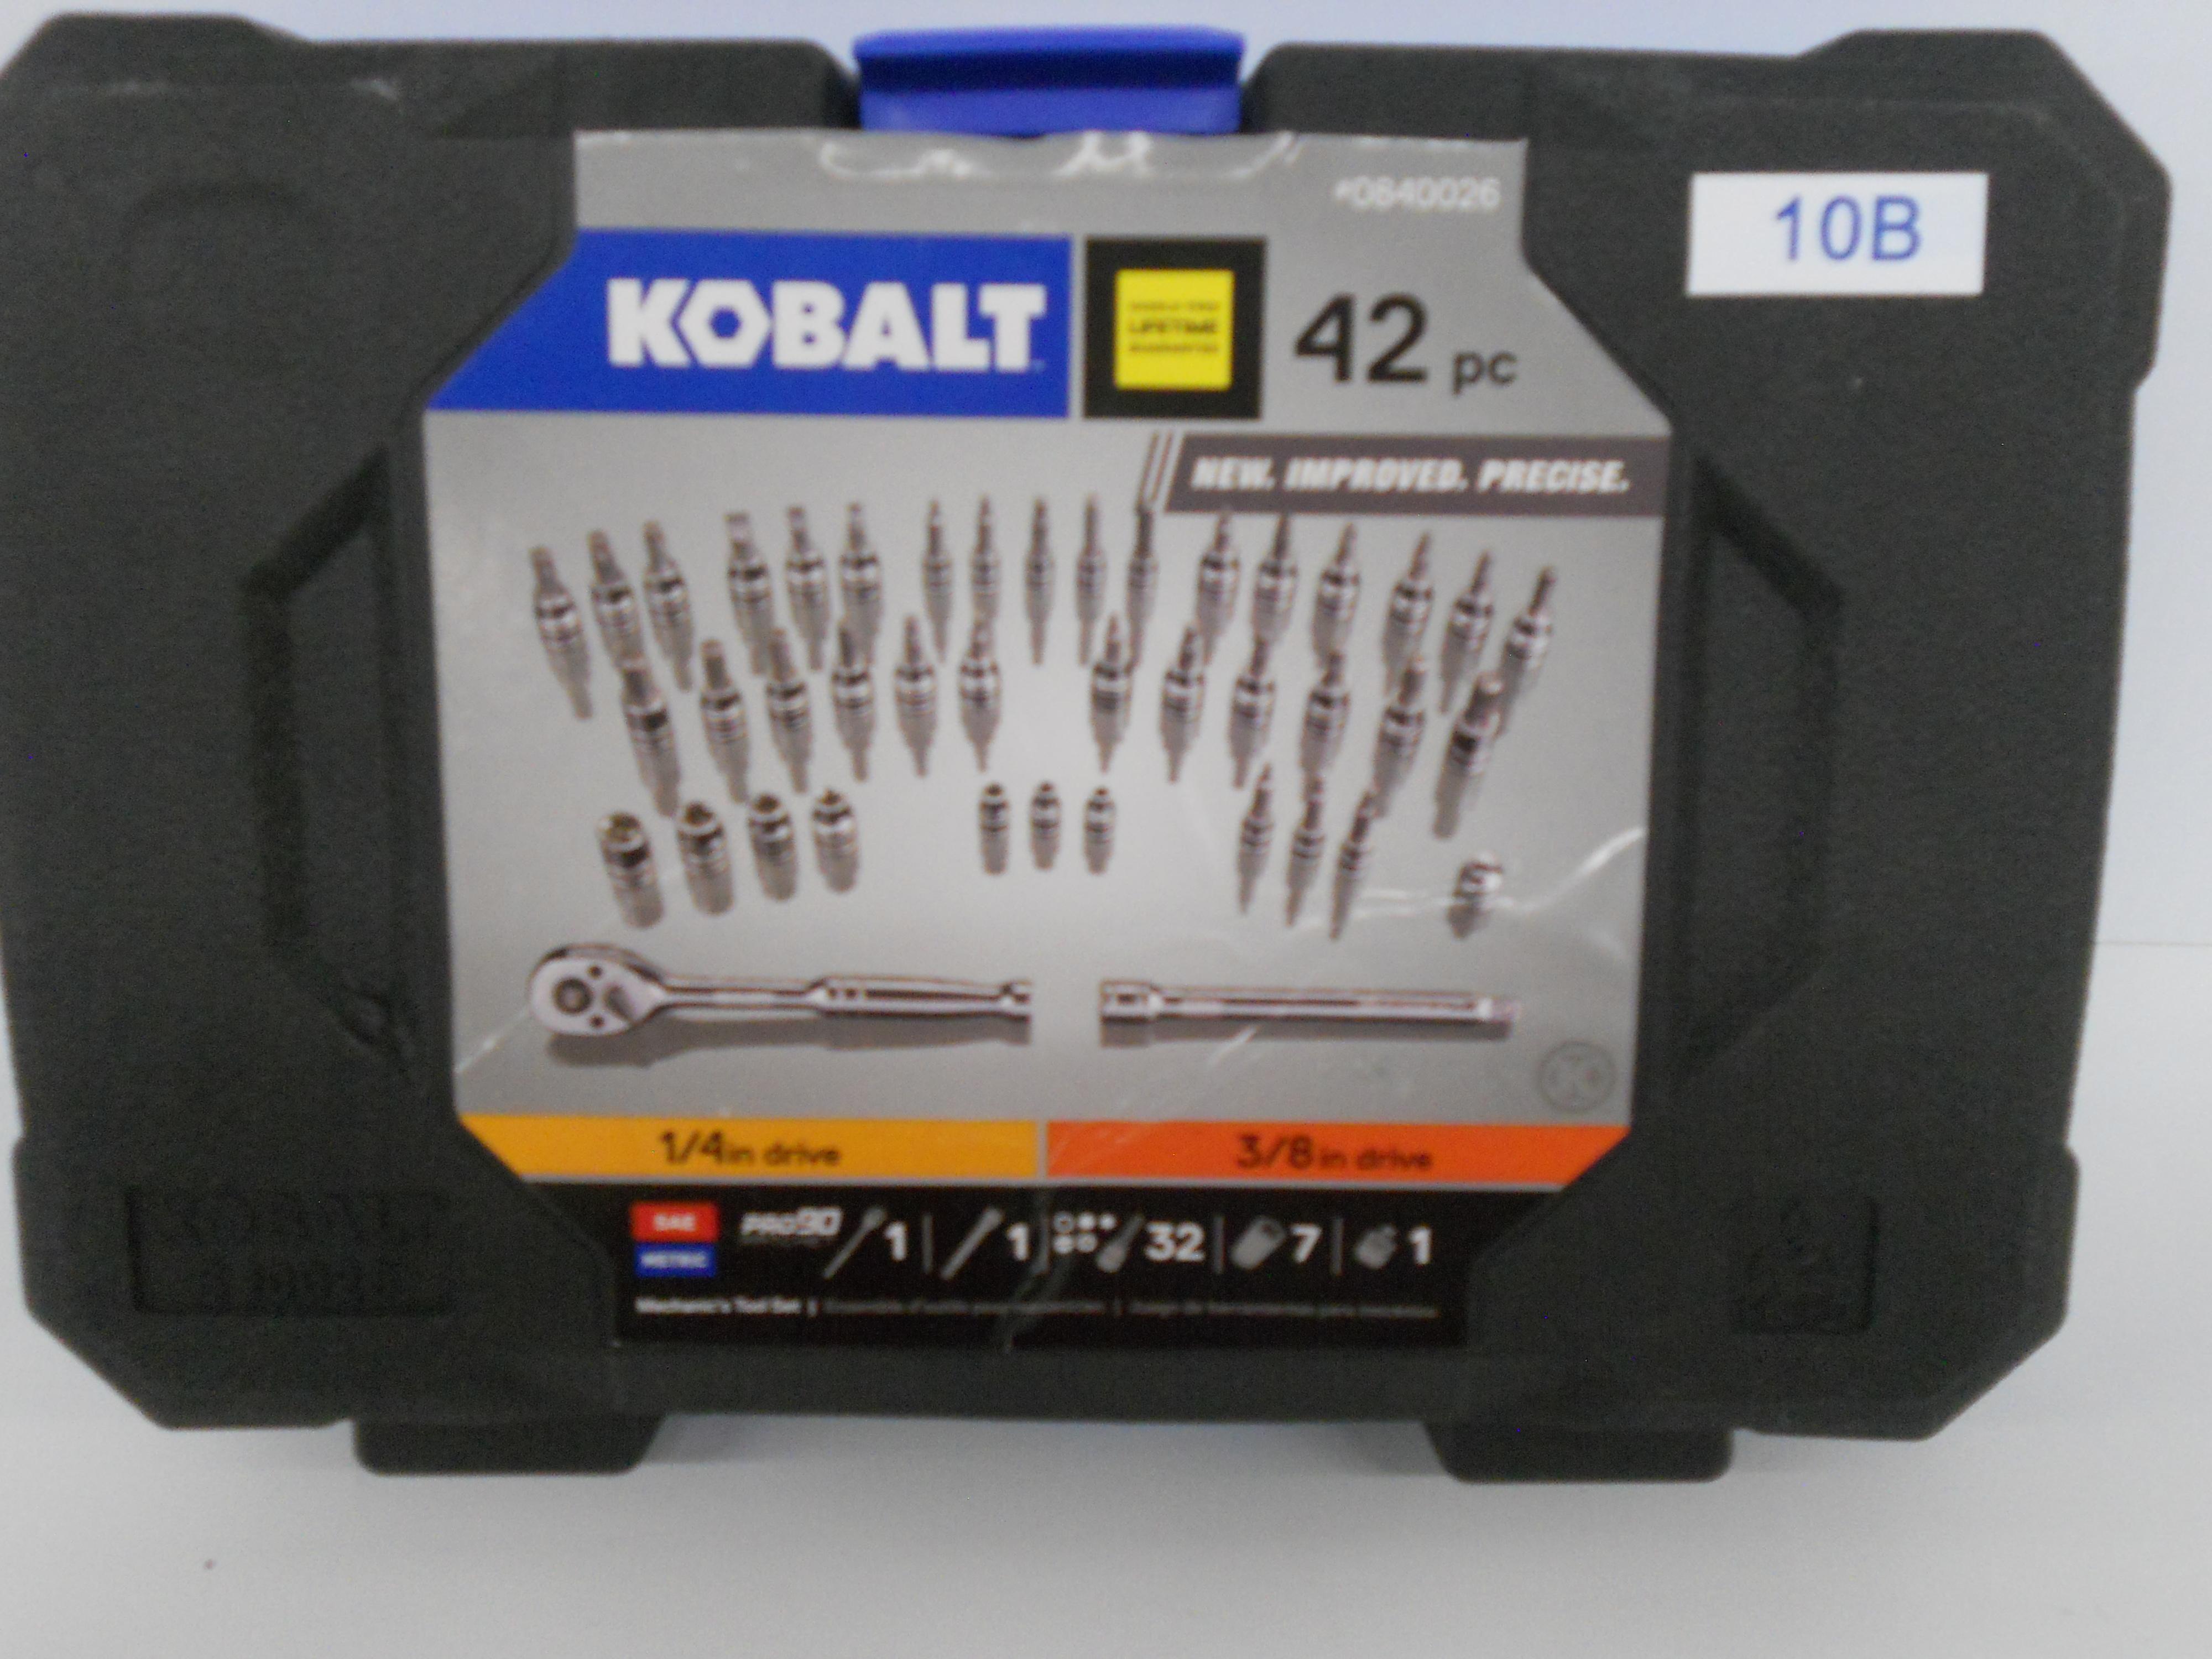 "Kobalt 42-piece SAE/metric 1/4"" & 3/8"" drive mechanics tool set"